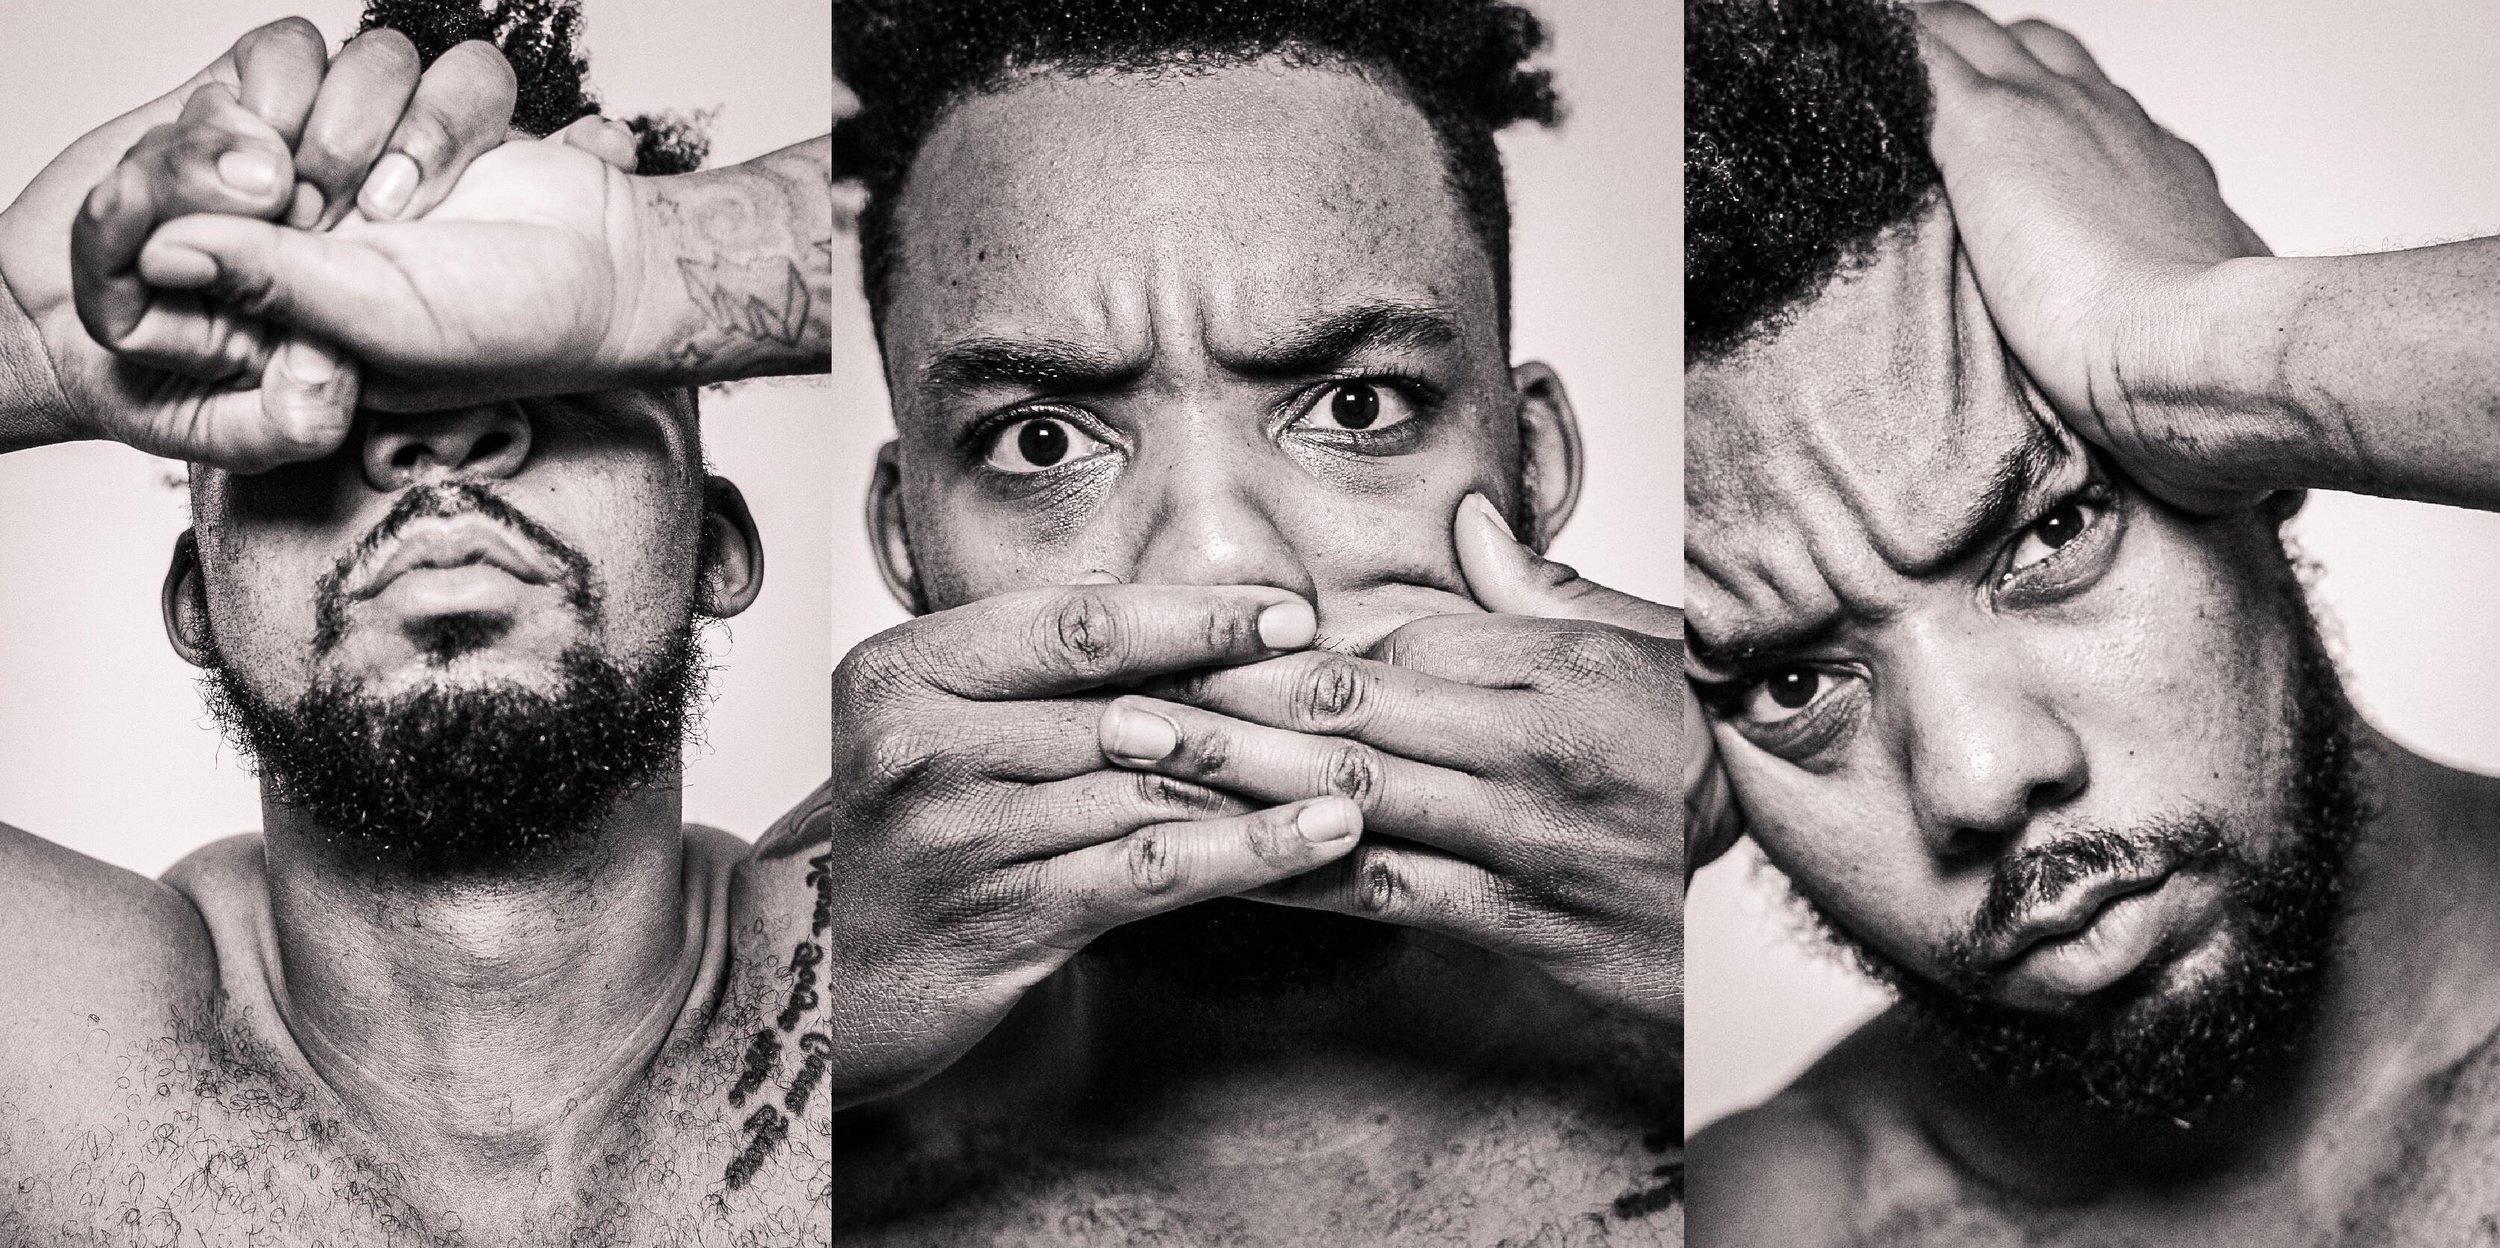 The Three-Wise Delgado- shot and edited by Deion Delgado